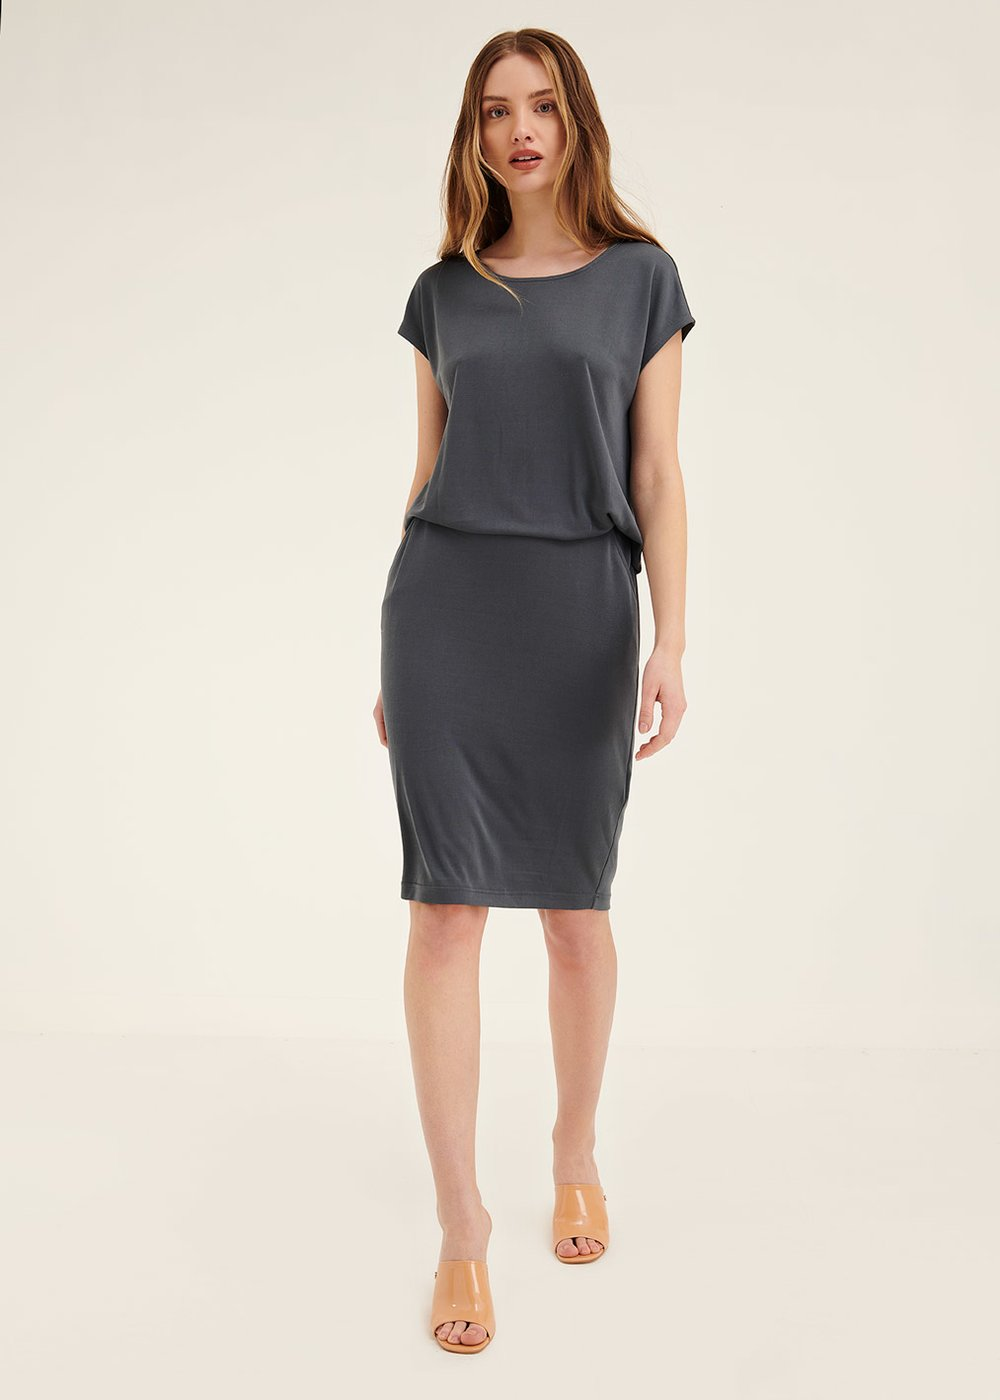 Alison modal jersey dress - Vulcano - Woman